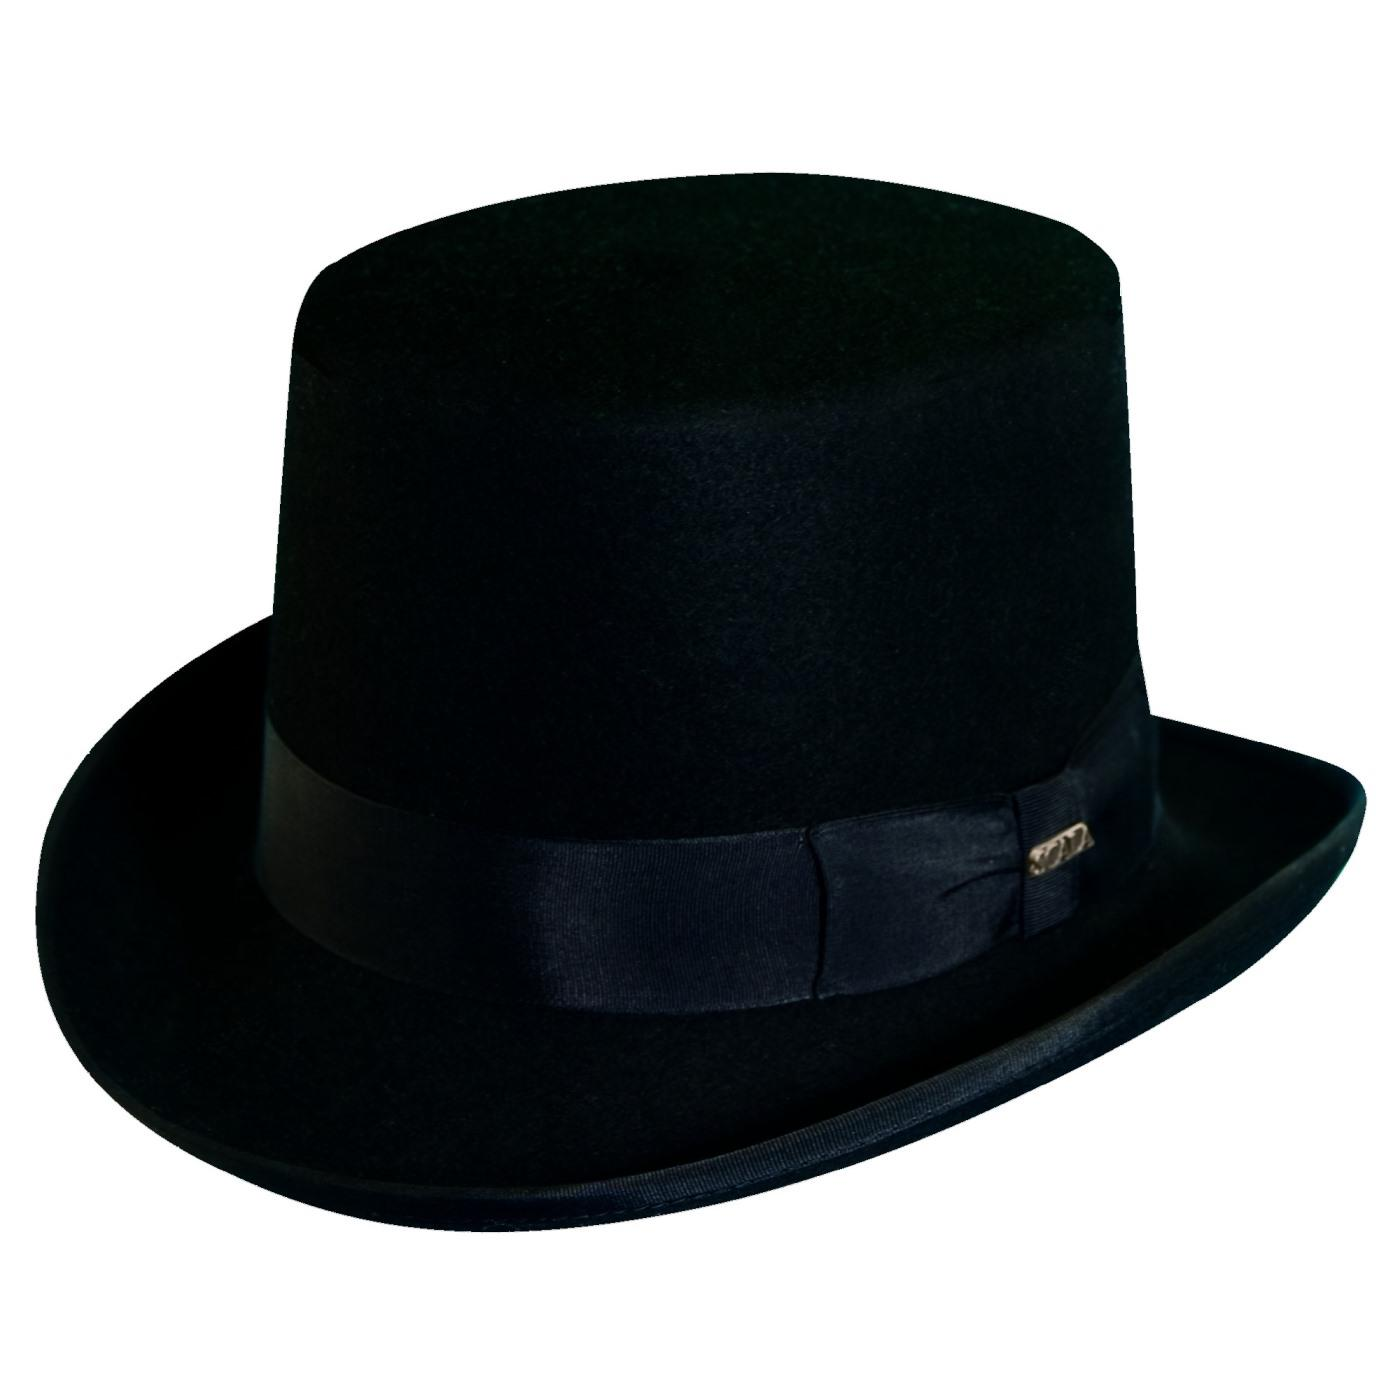 2f50cb9e047600 Dorfman Pacific Men's Wool Felt Traditional Top Hat